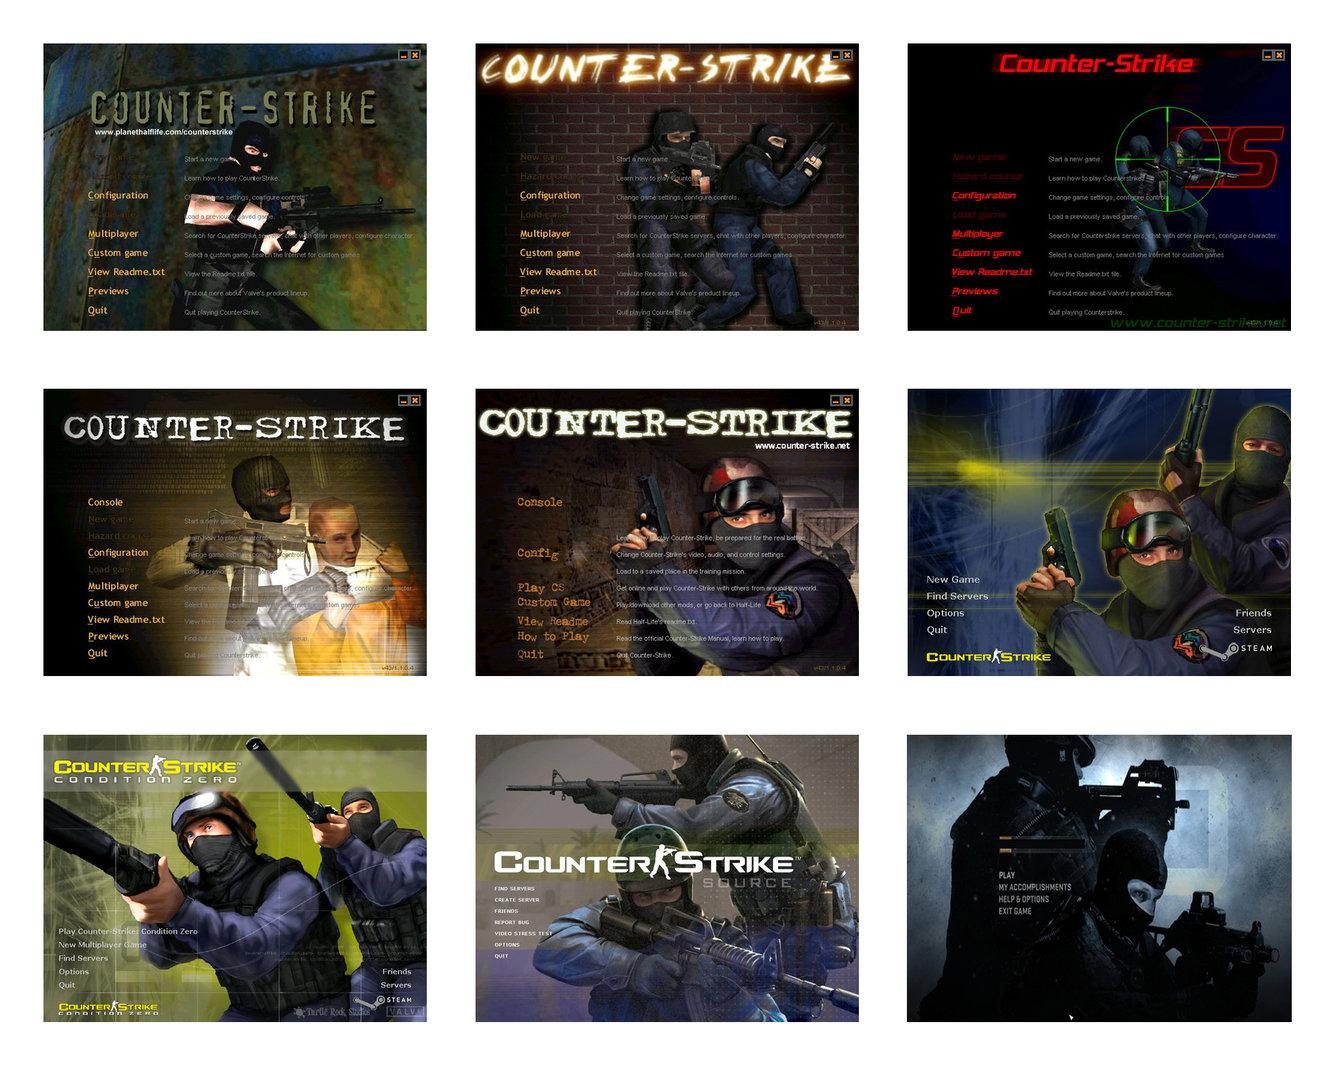 Counter-Strike im Wandel